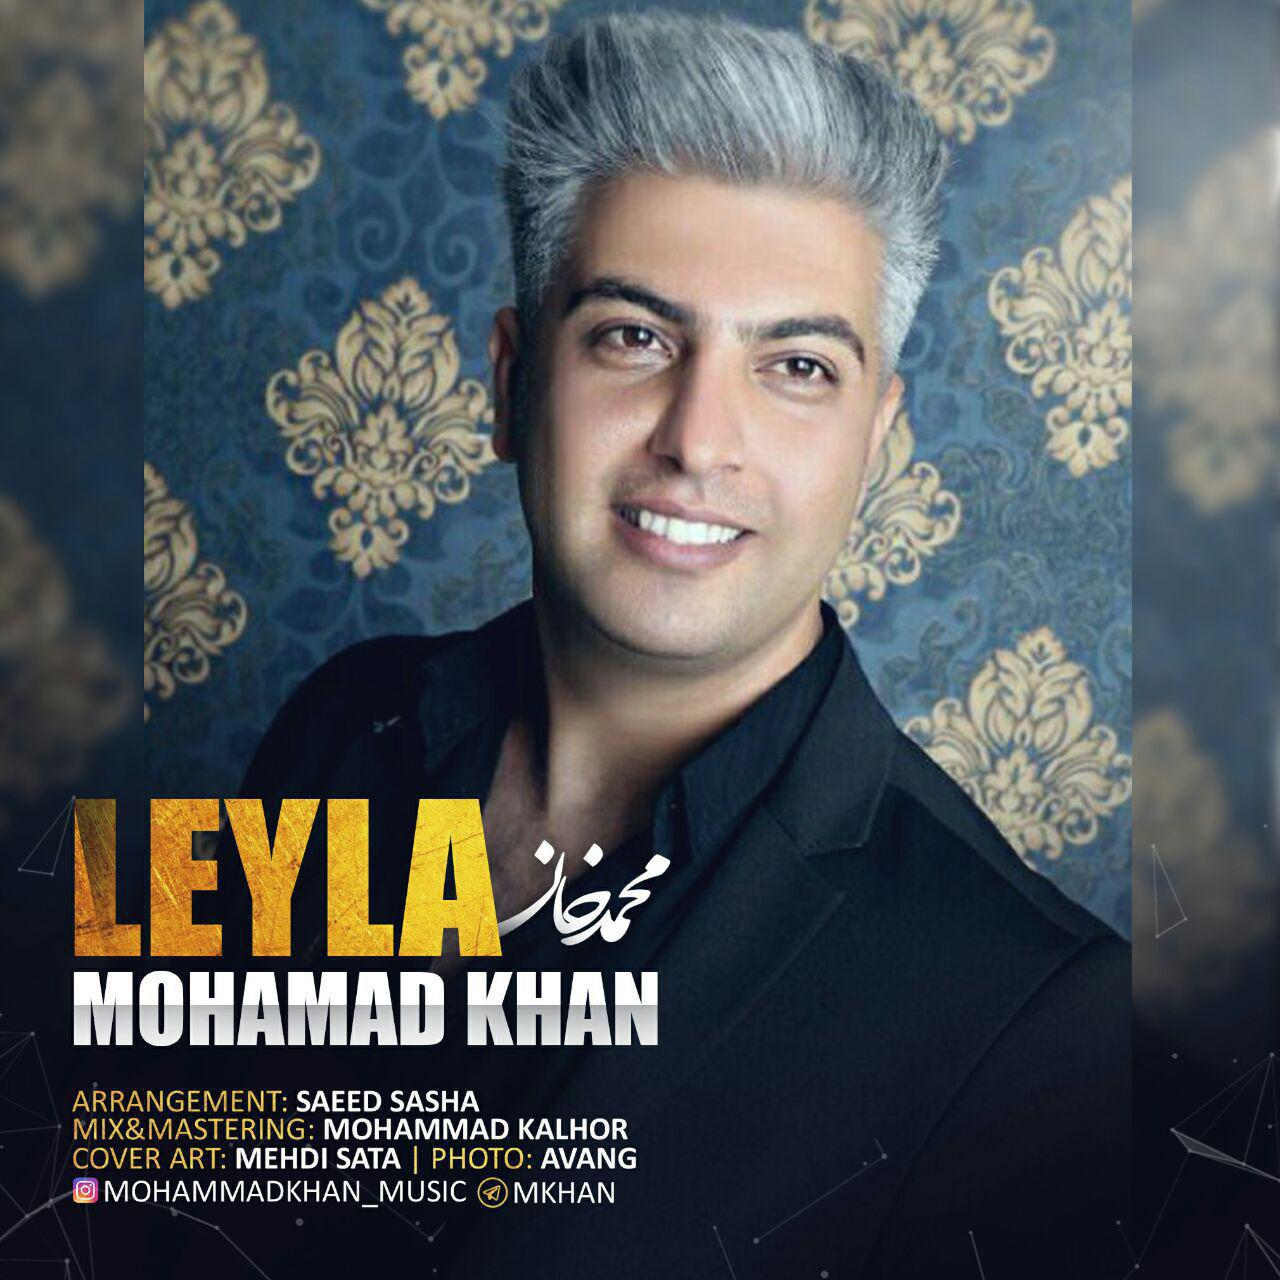 http://s8.picofile.com/file/8332036684/32Mohammad_Khan_Leyla.jpg